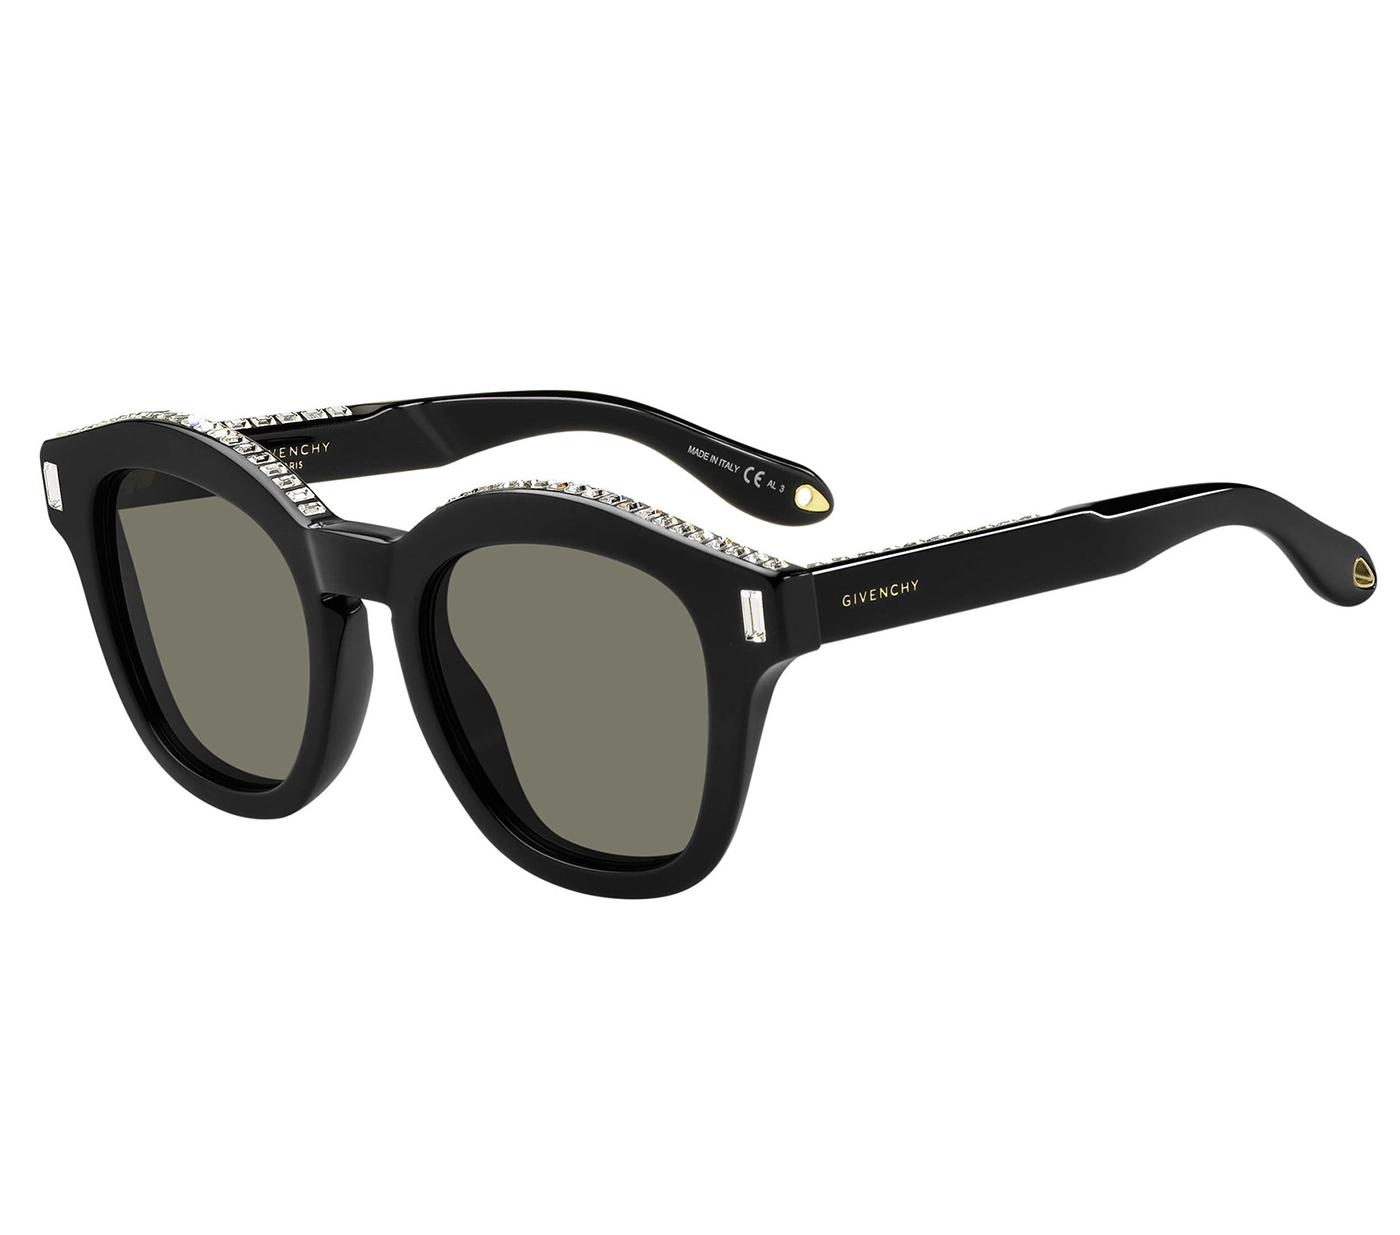 Givenchy GV 7070/S Crystal Embellished Sunglasses